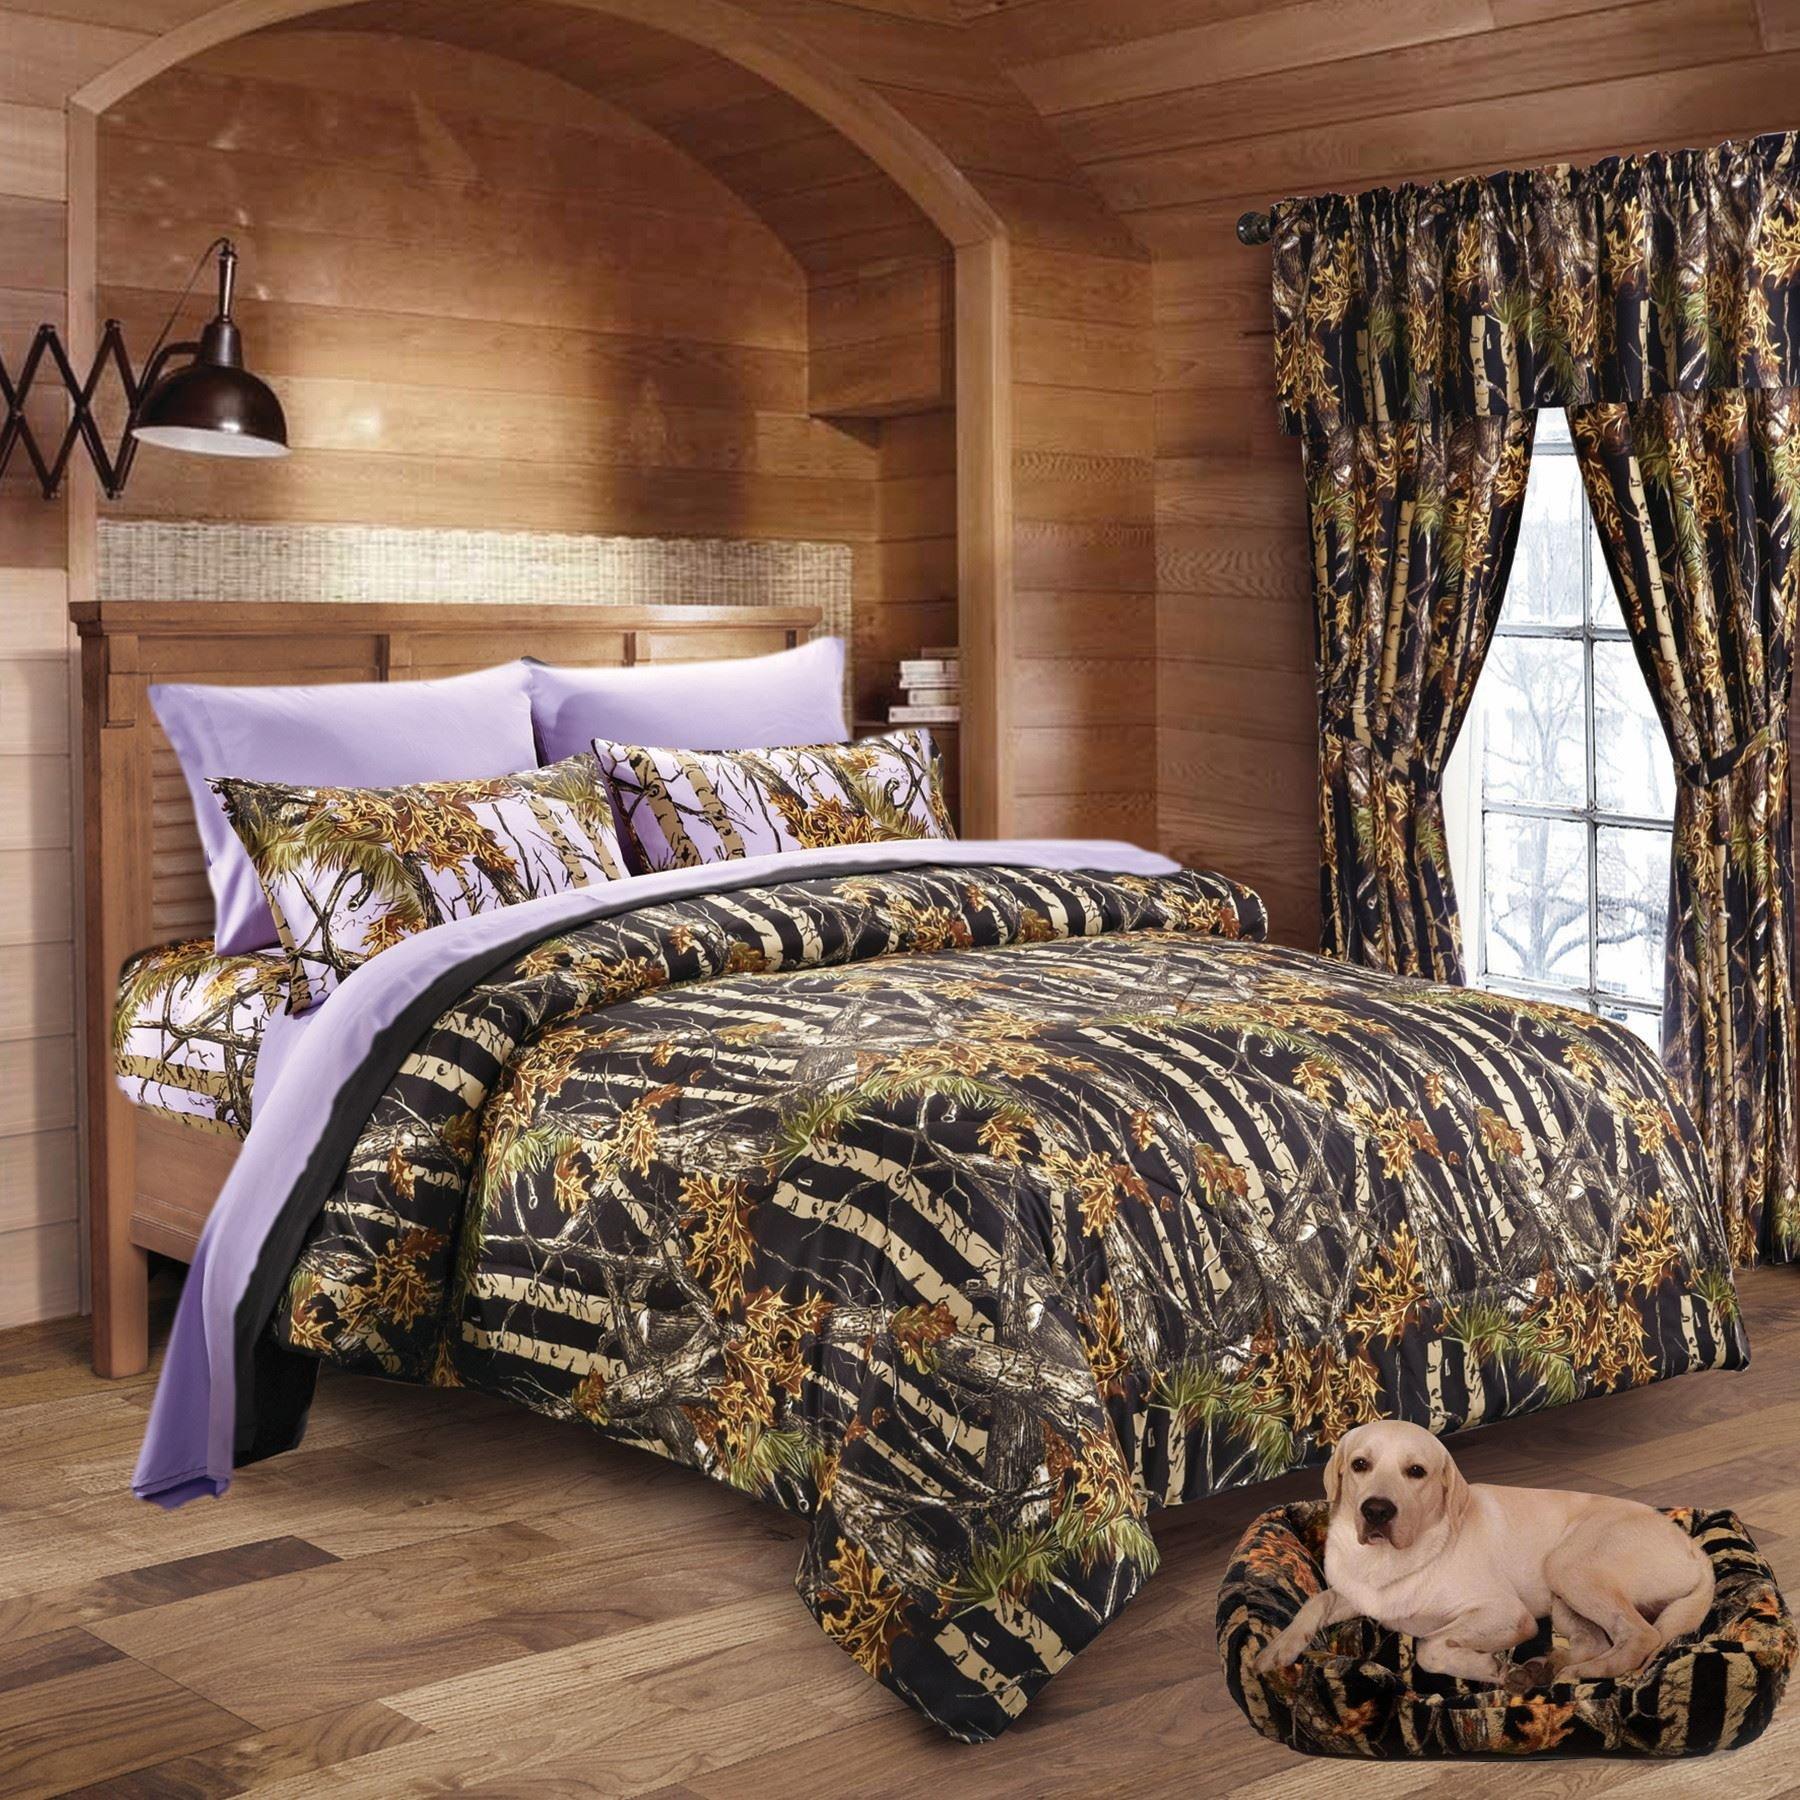 20 Lakes Woodland Hunter Camo Comforter, Sheet, Pillowcase Set (Queen, Black & Purple)